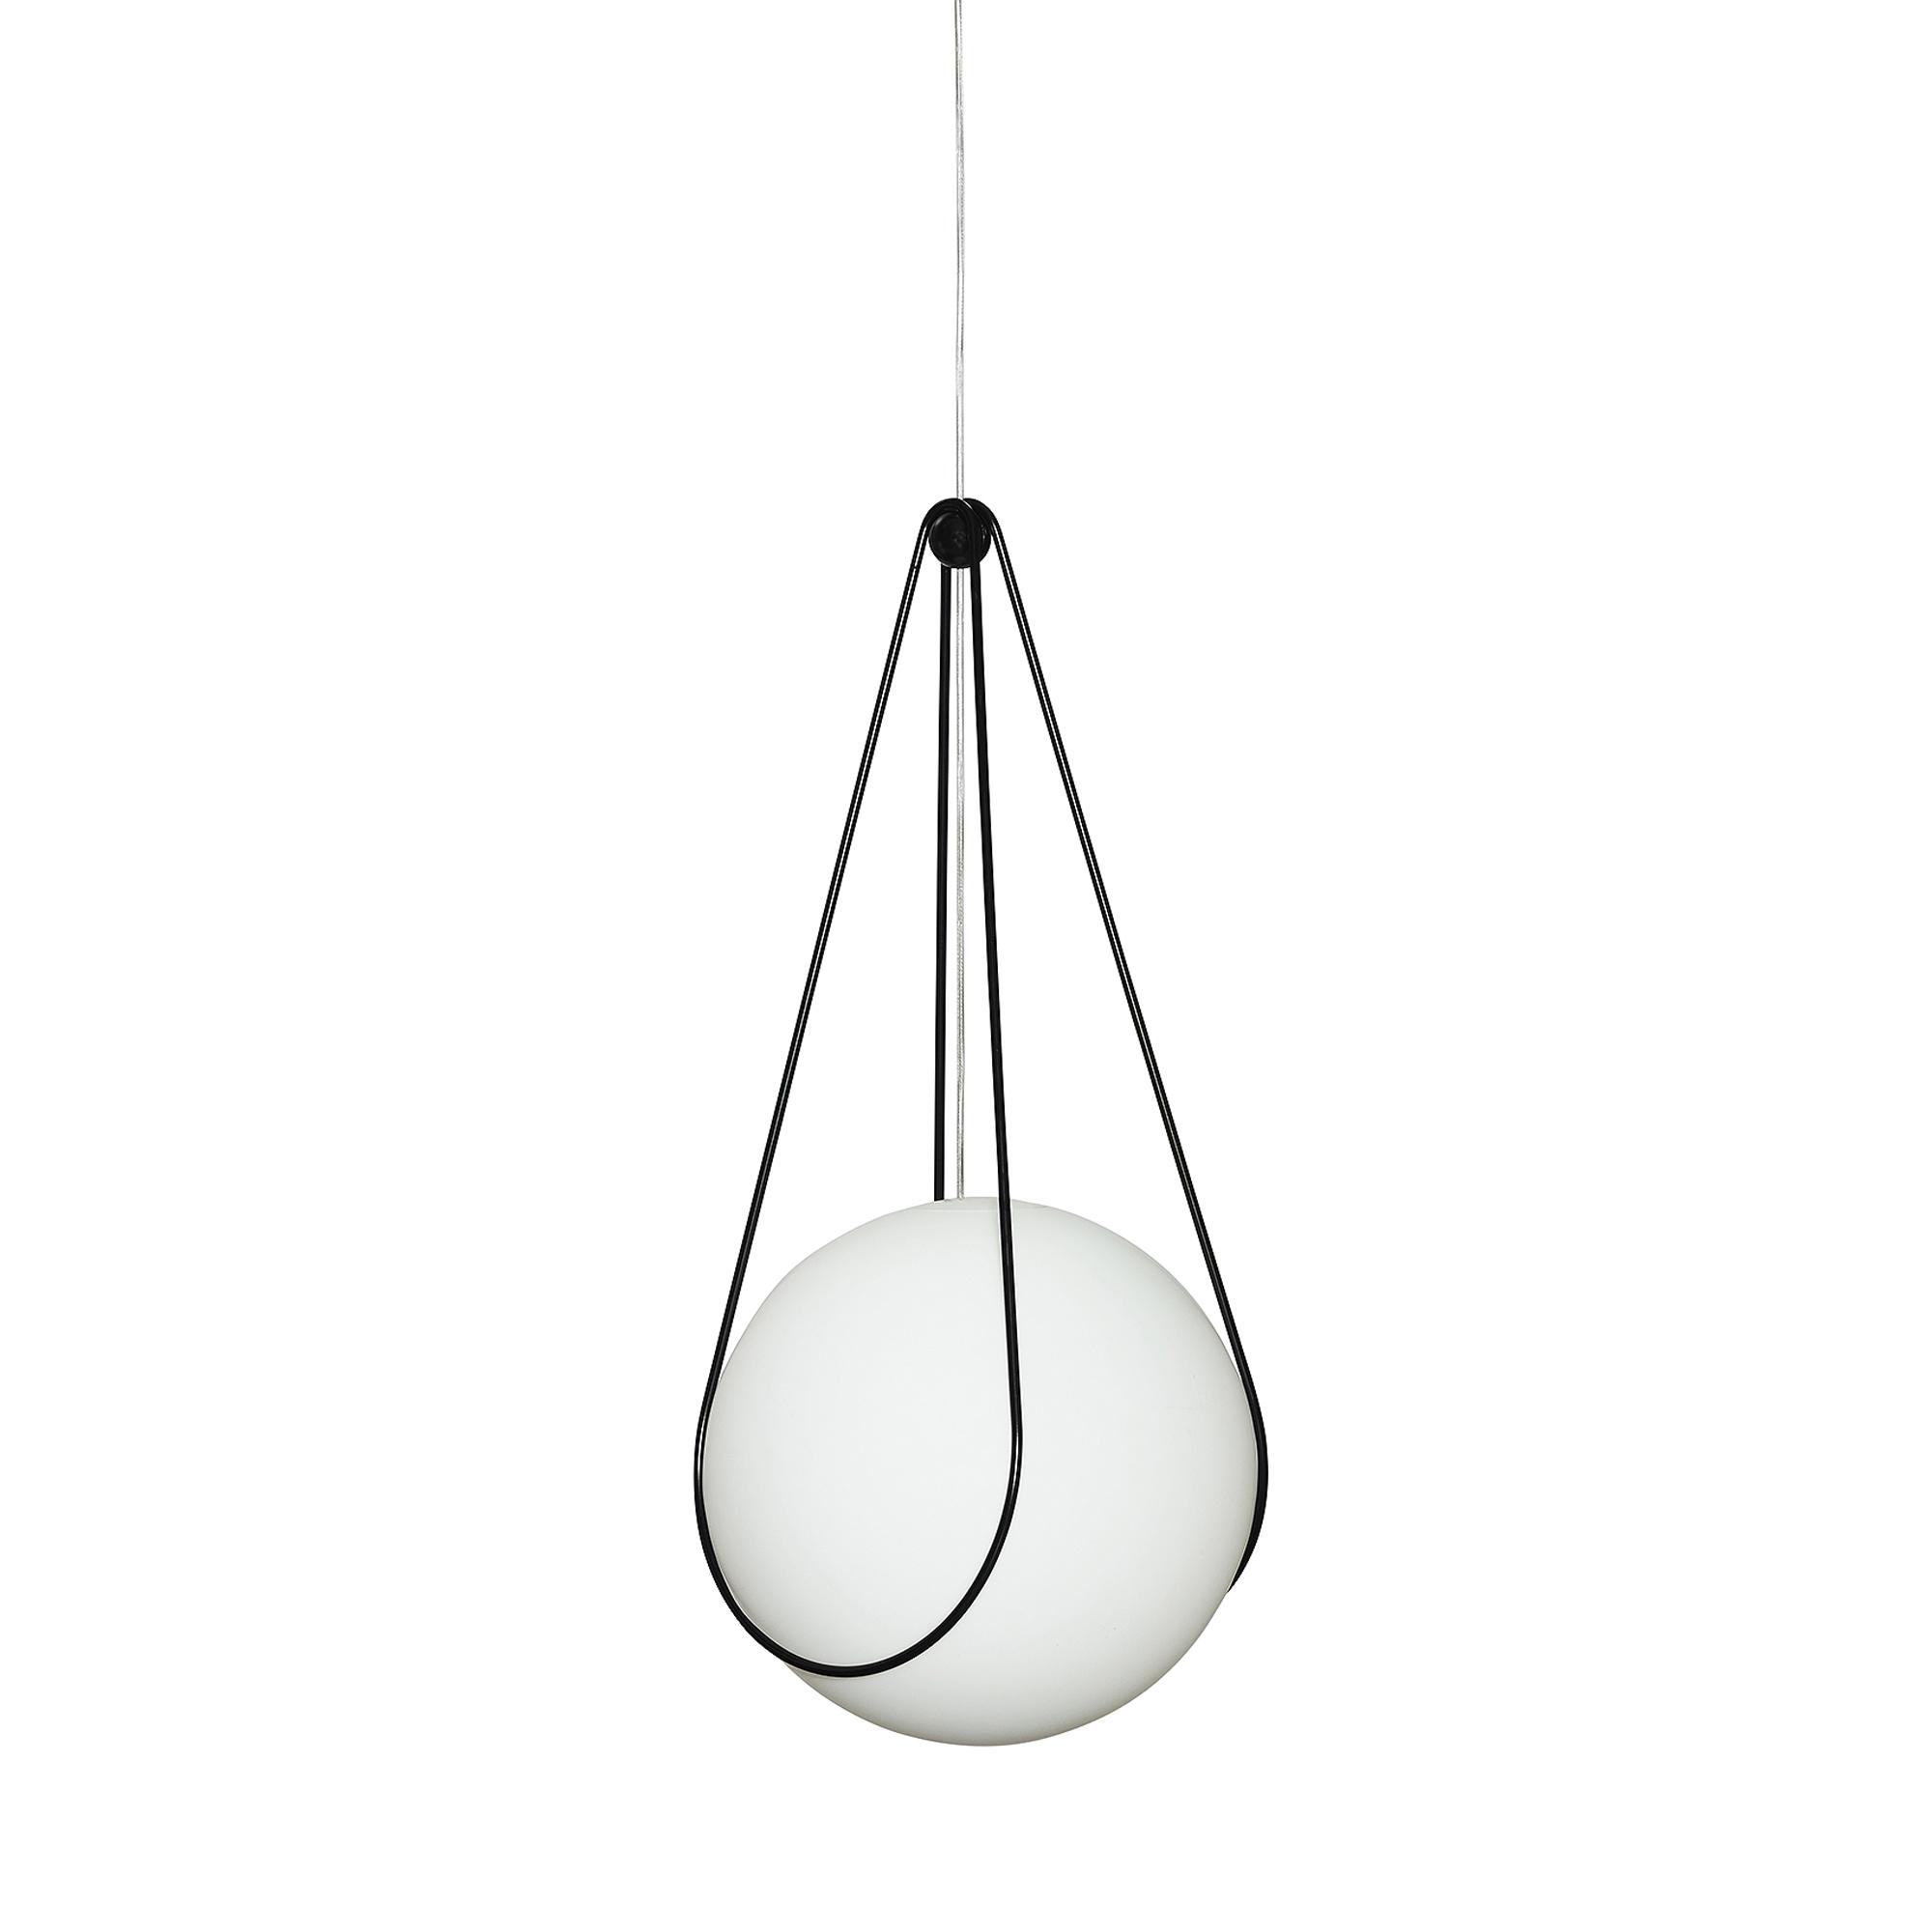 Design House Stockholm Lamphållare Kosmos 400mm svart